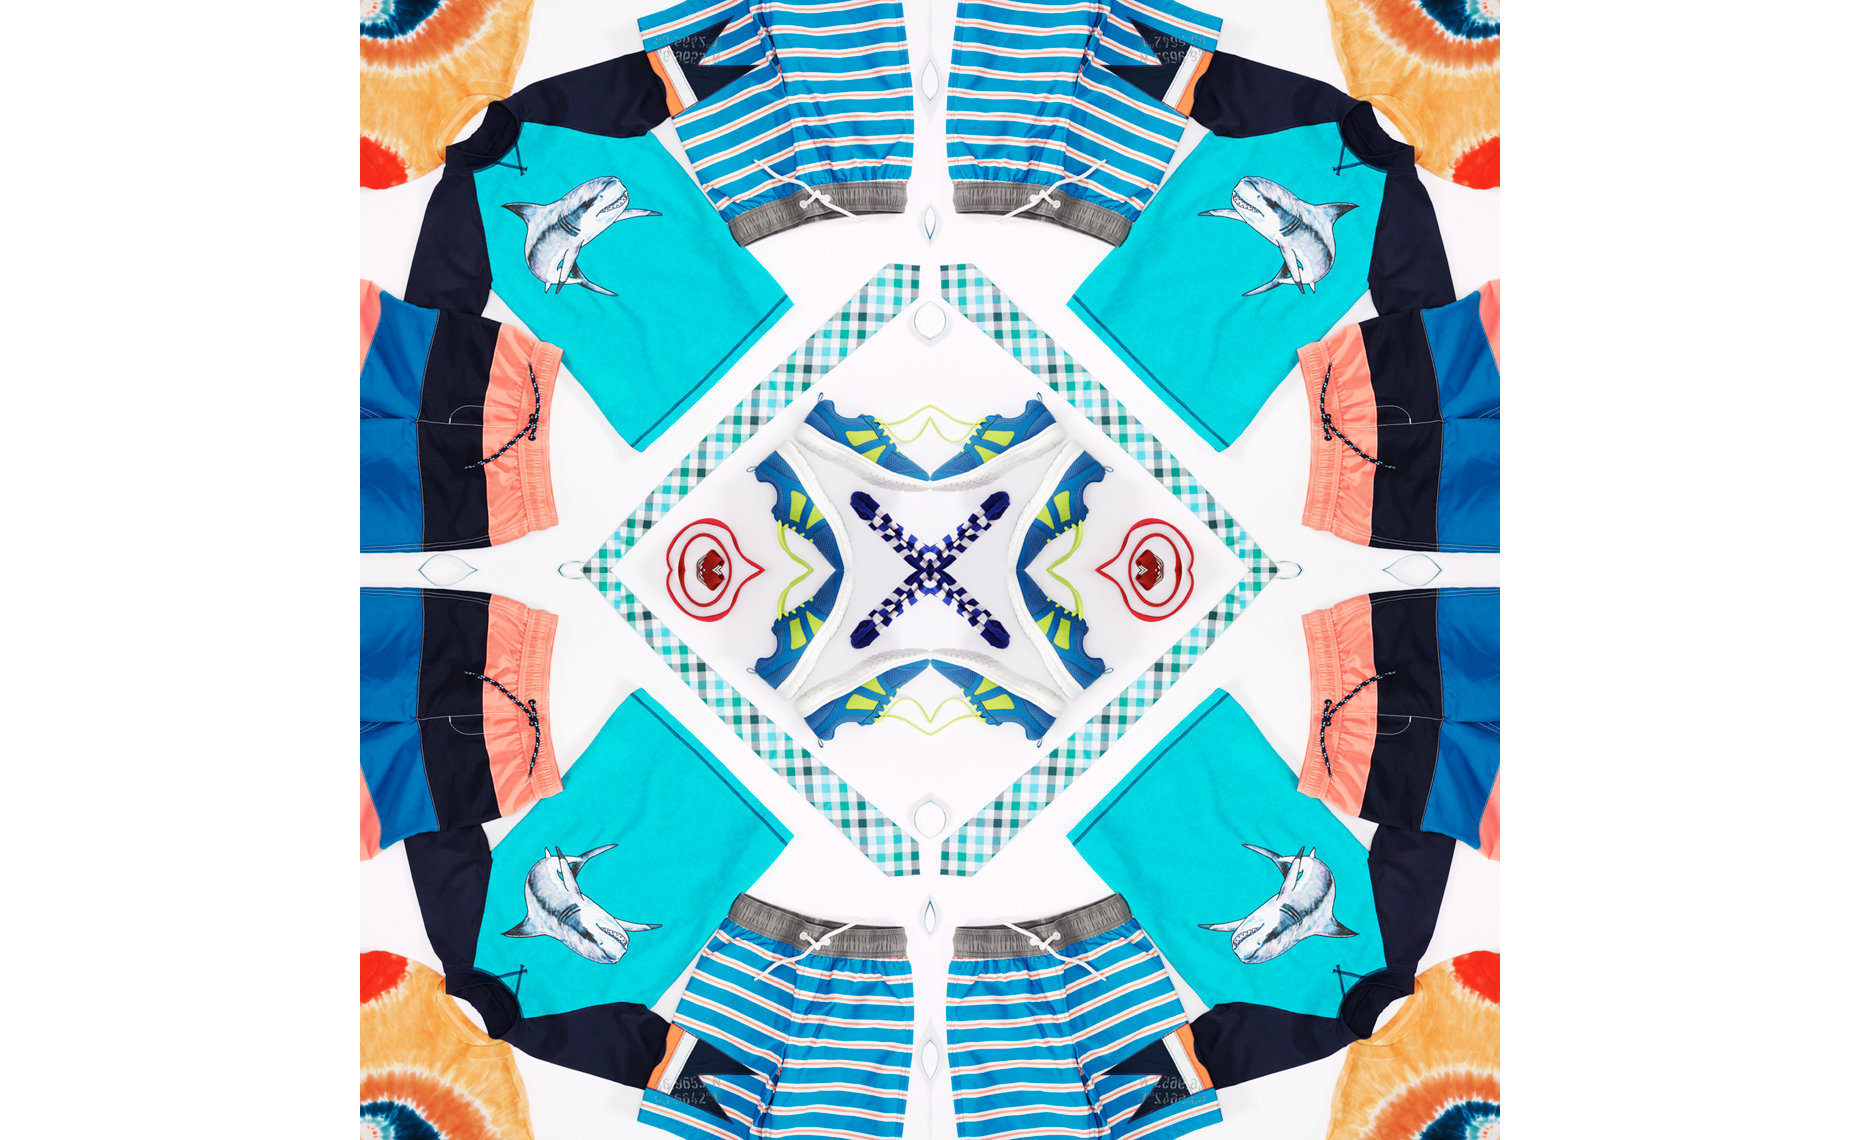 InstagramKaleidoscope3_759-web.jpg